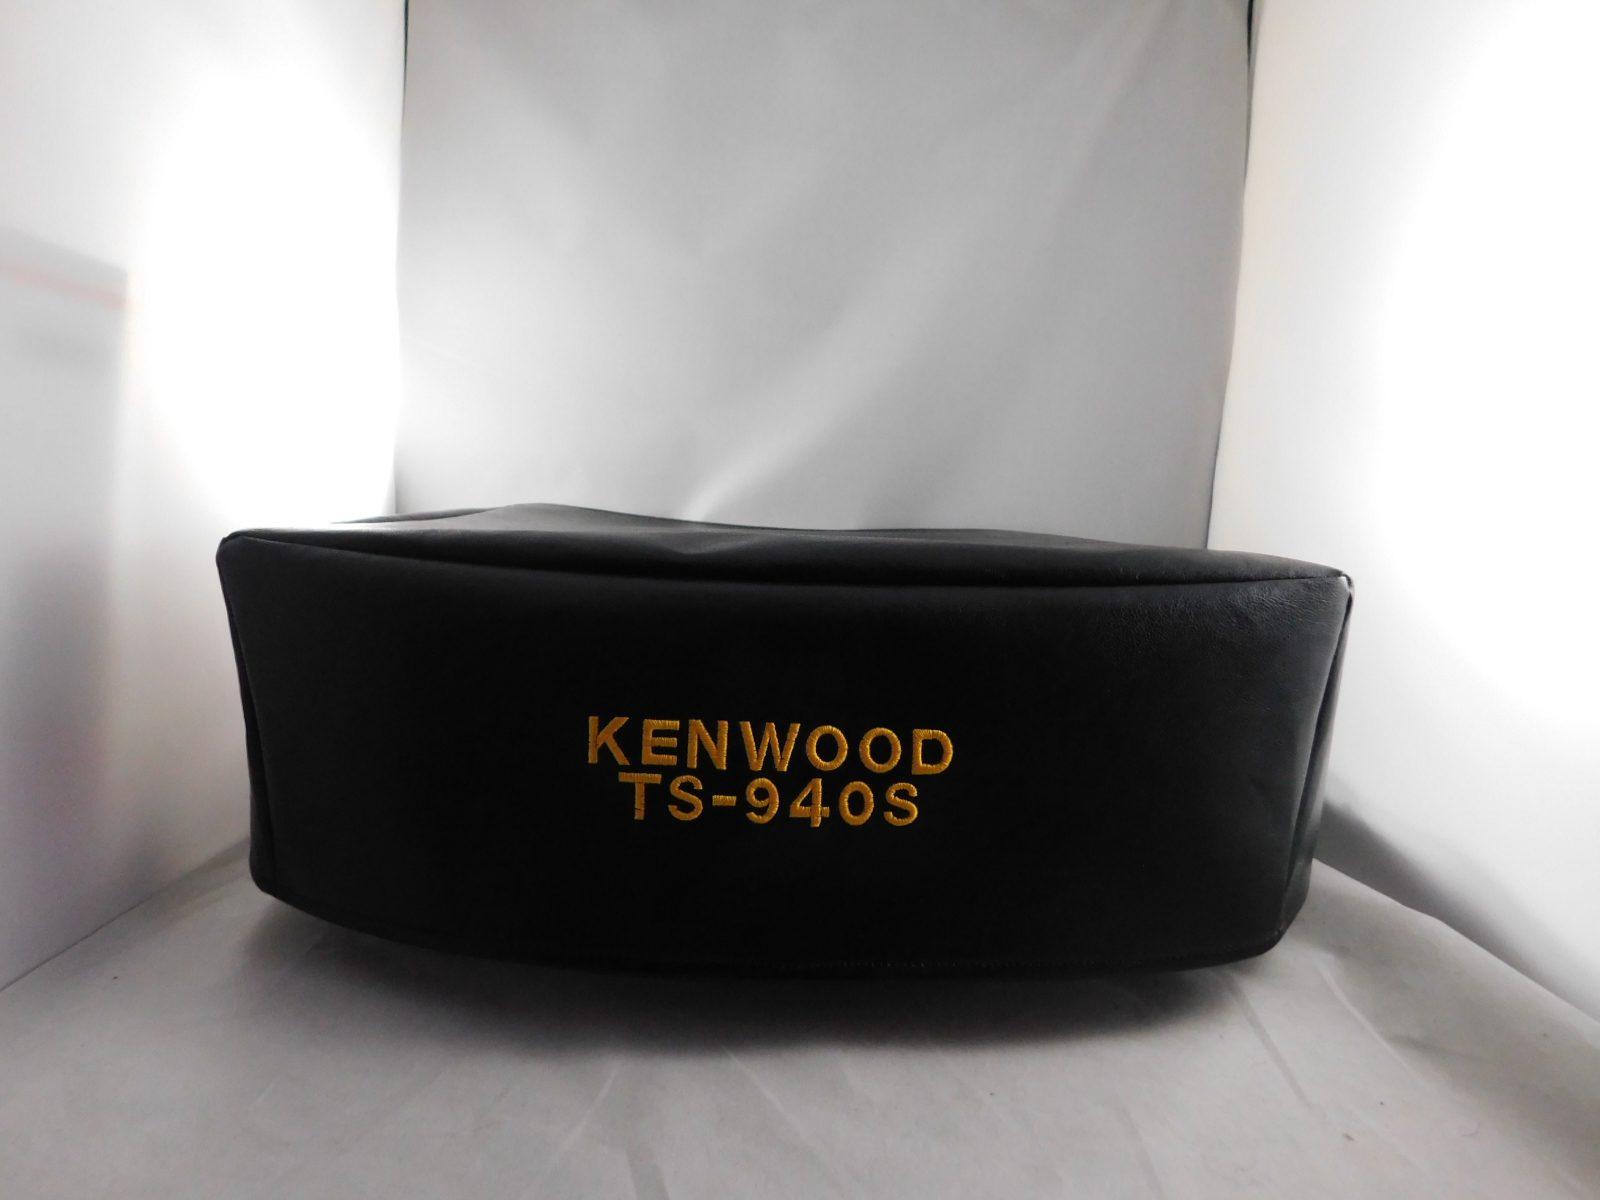 Kenwood TS-940 Series Ham Radio Dust Cover